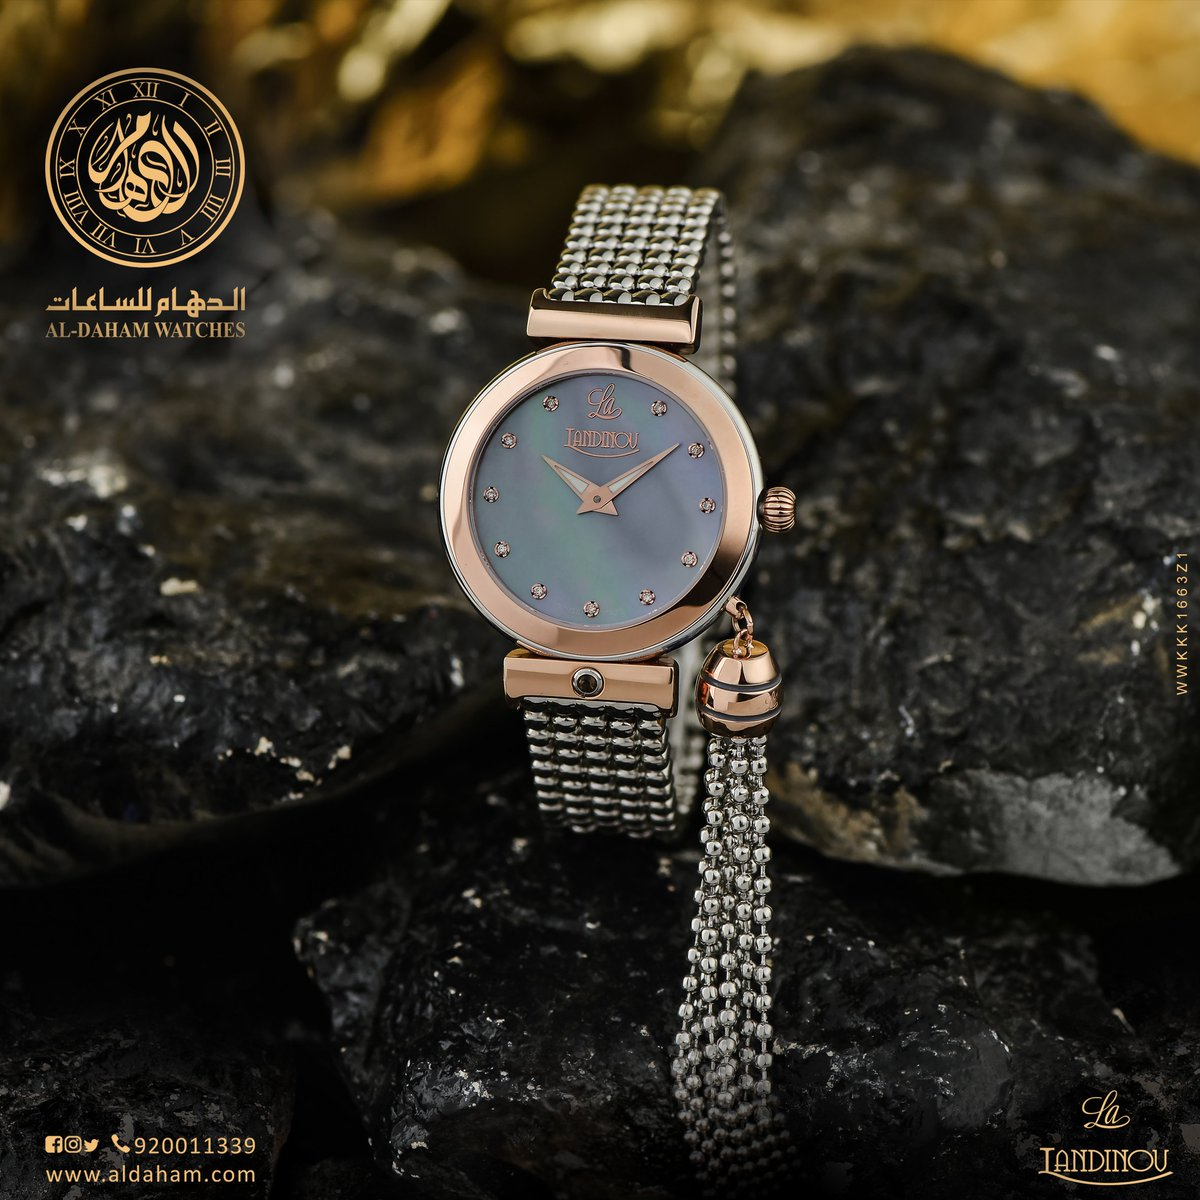 011476c0e #ساعة #لاندينوف بجمال الونها النابع من تصميمها الفريد لأجمل المناسبات من  #الدهام_للساعات pic.twitter.com/3CWUKeq65e